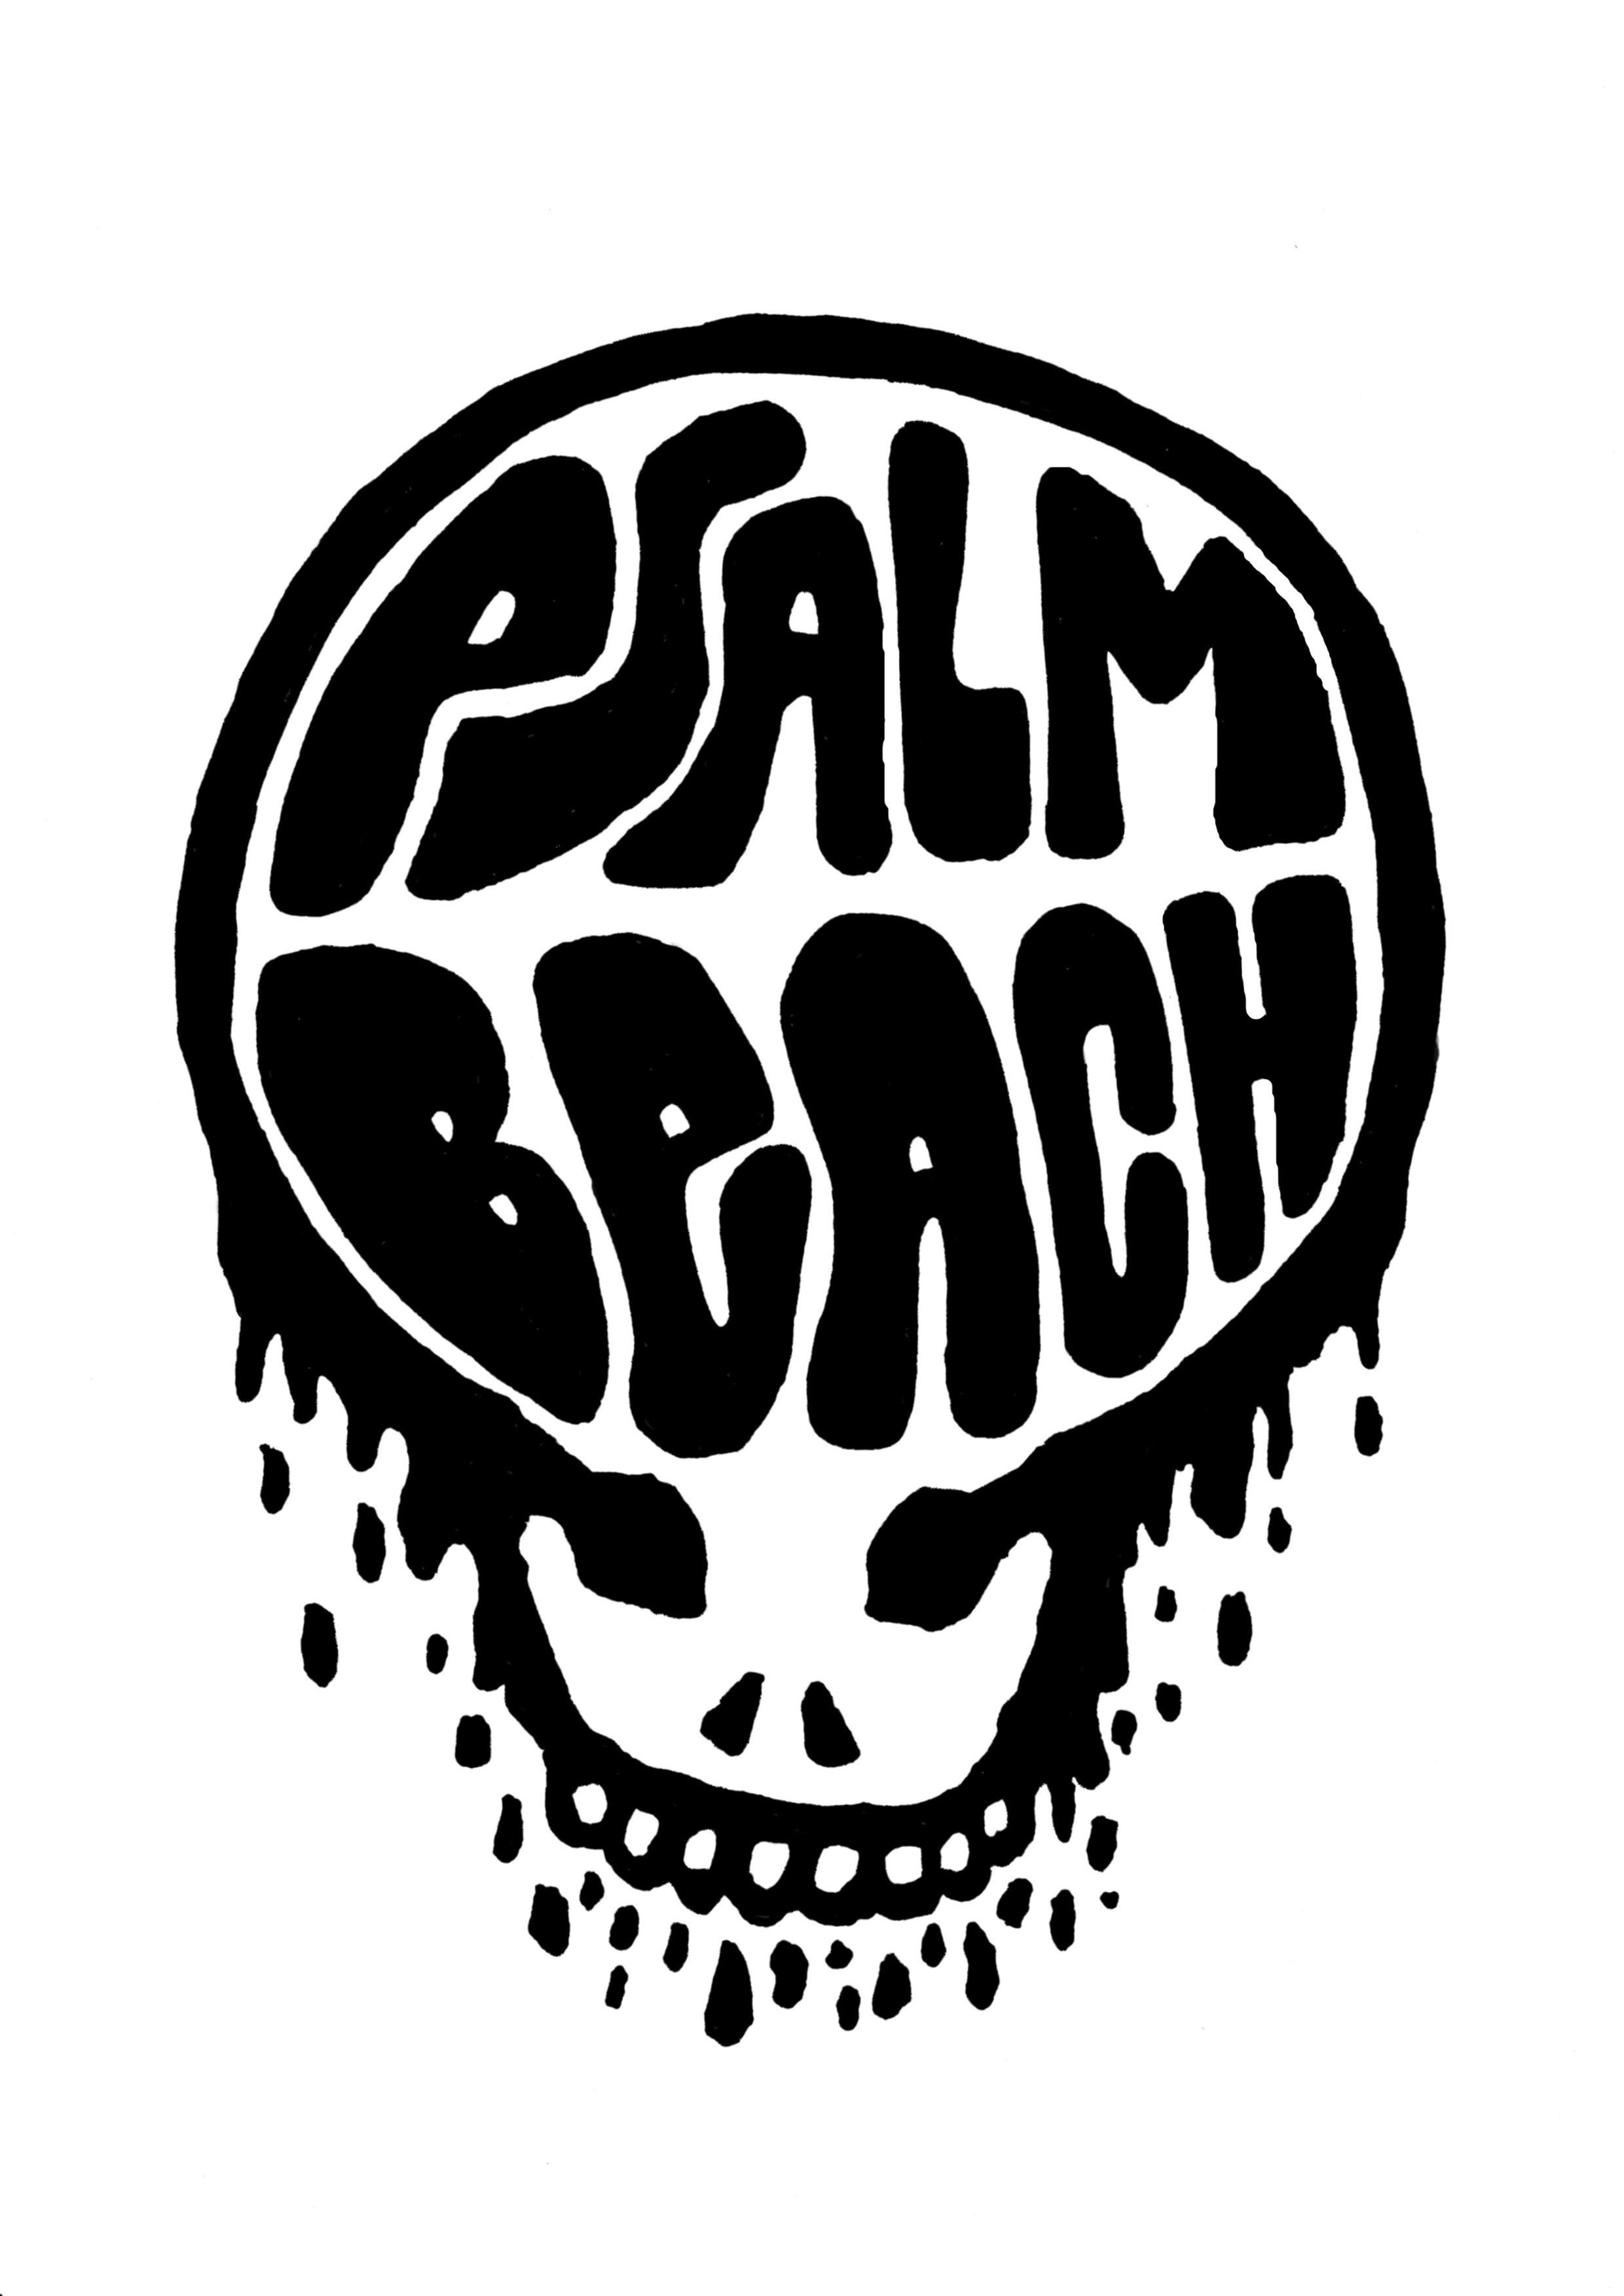 Psalm Beach